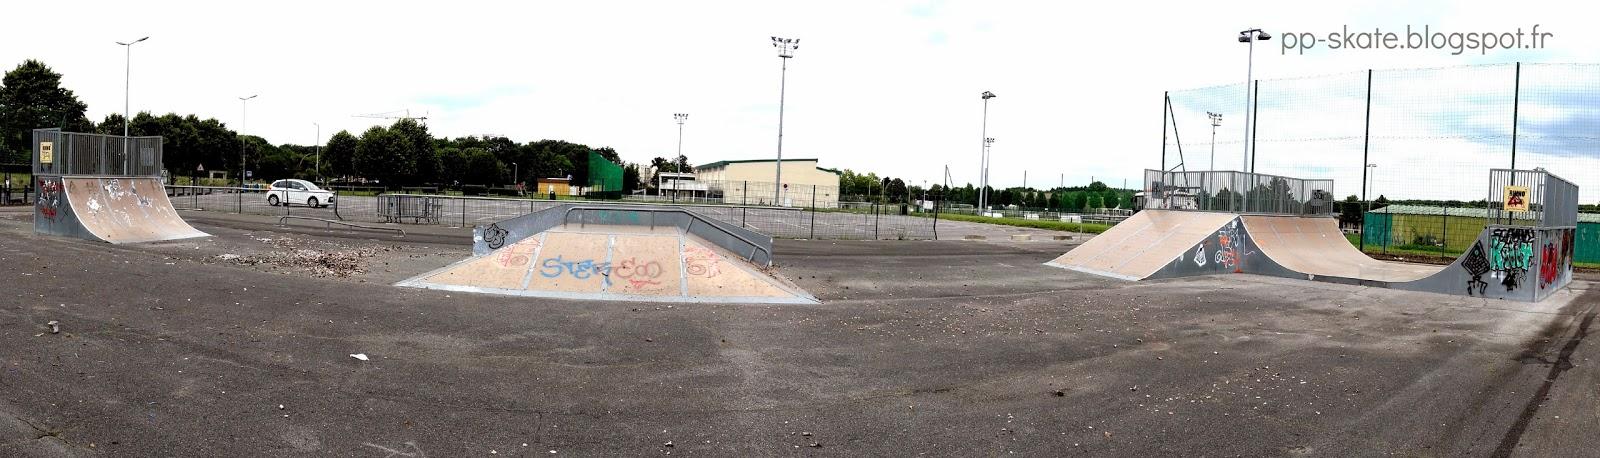 skatepark fleury merogis